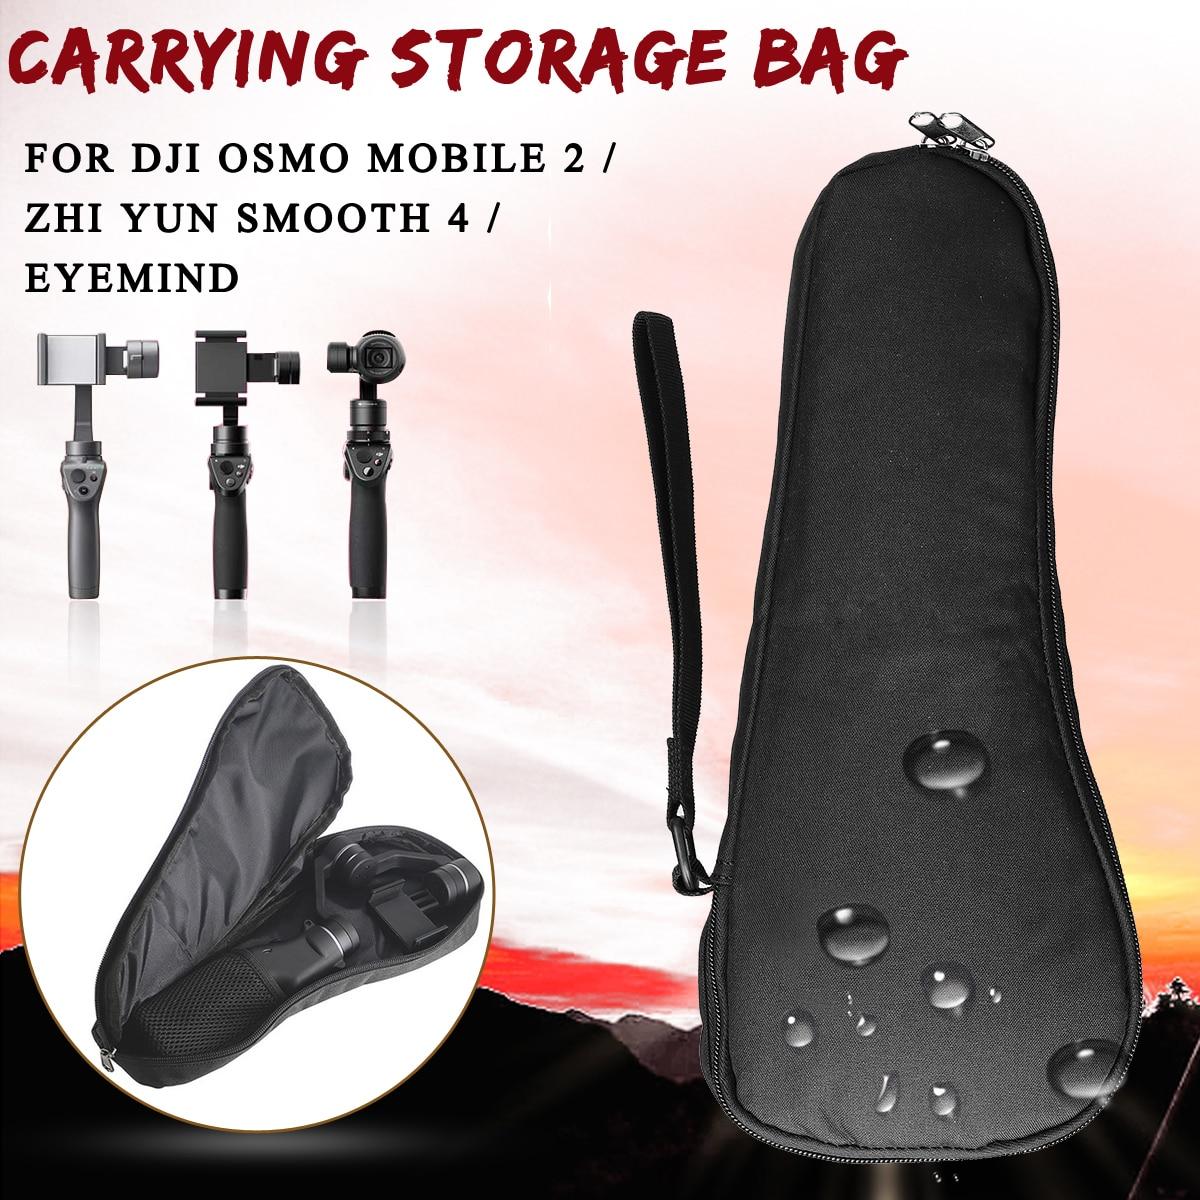 Portátil impermeable bolsa de mano paquete estuche protector para DJI para OSMO móvil 2/para Zhi Yun Suave 4 /para Eyemind